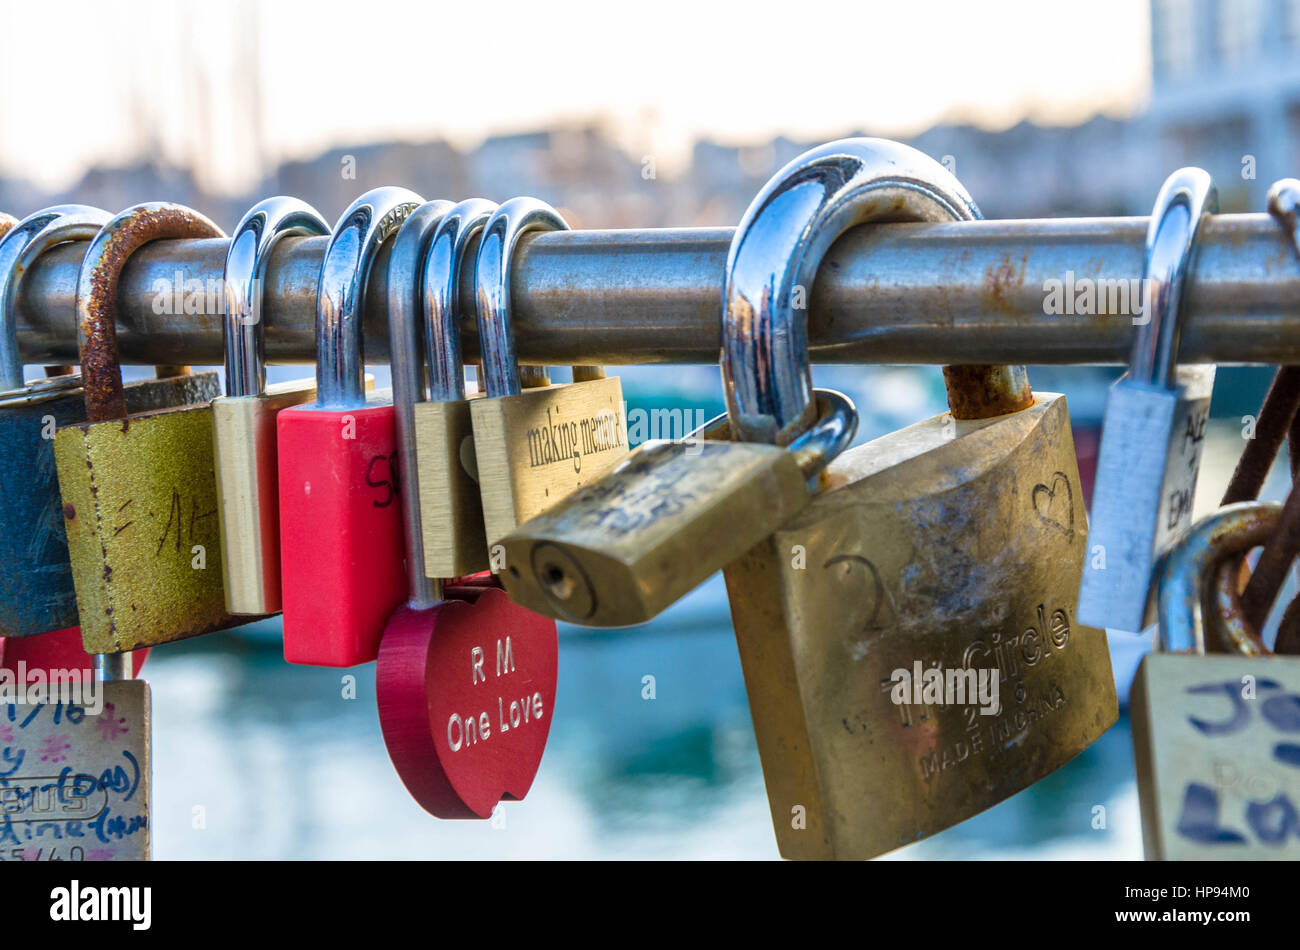 love-locks-left-on-peros-bridge-which-spans-bristol-harbour-romantic-HP94M0.jpg